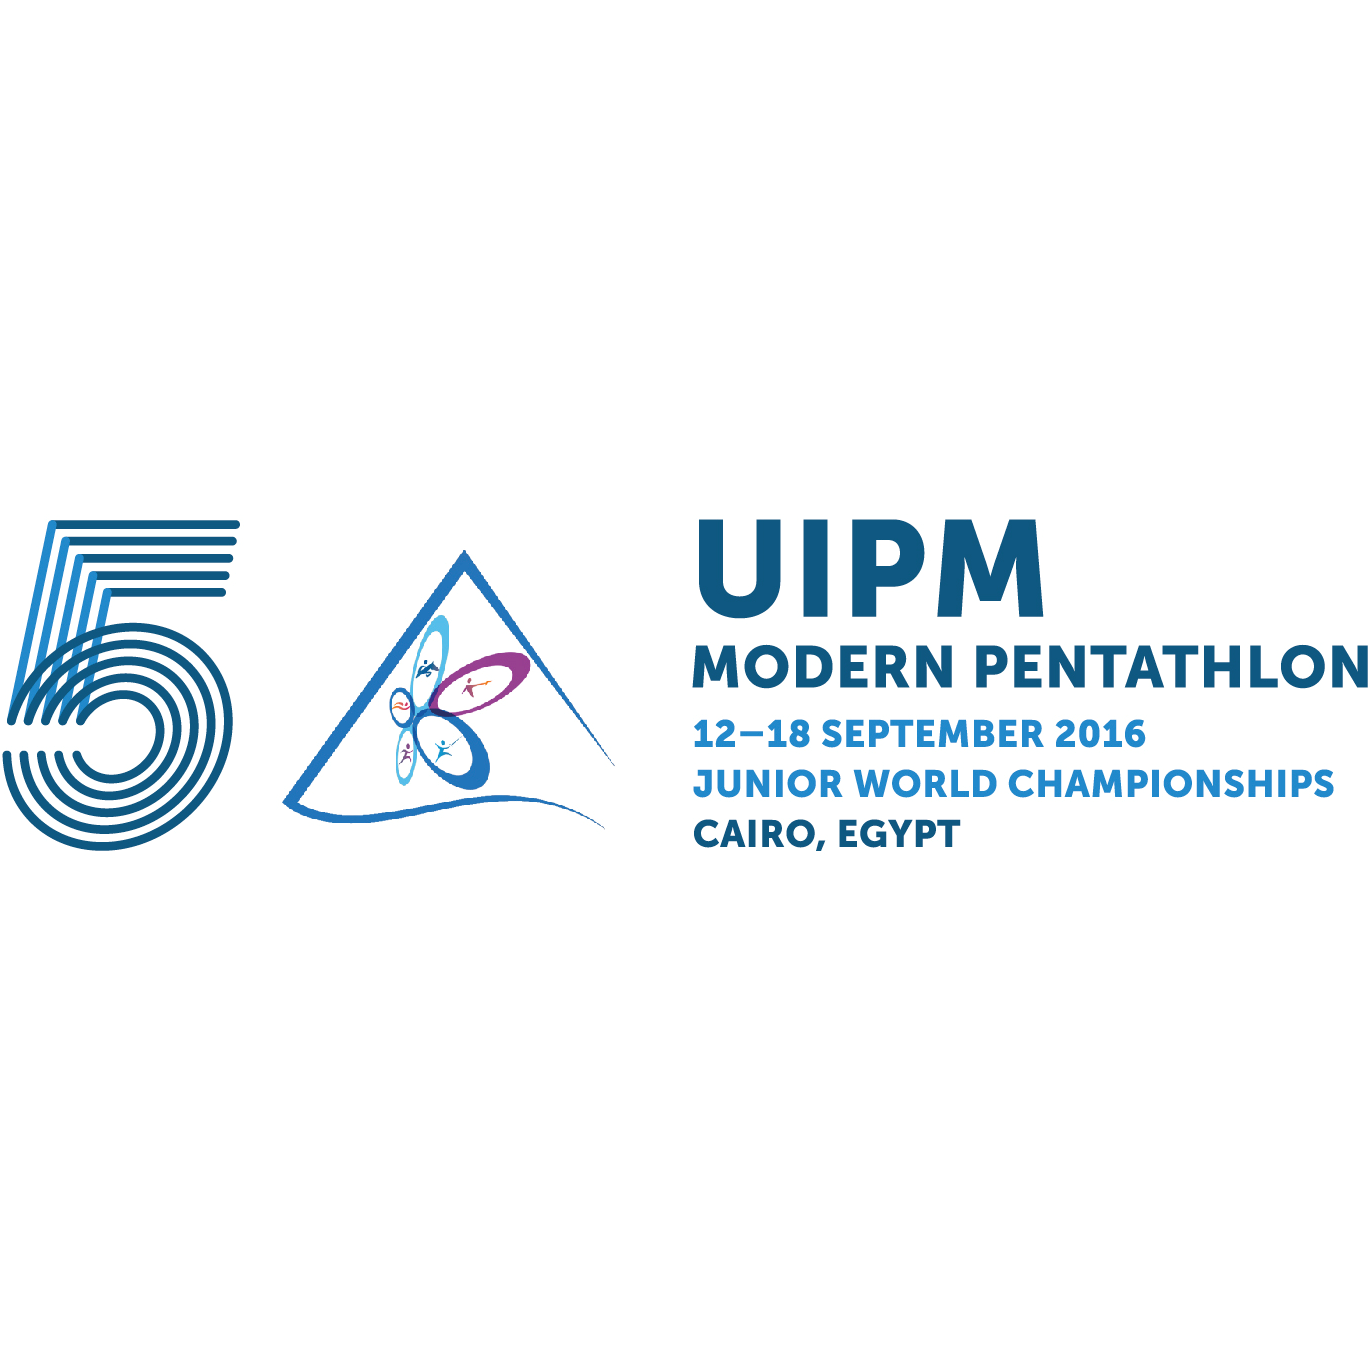 2016 Modern Pentathlon Junior World Championships